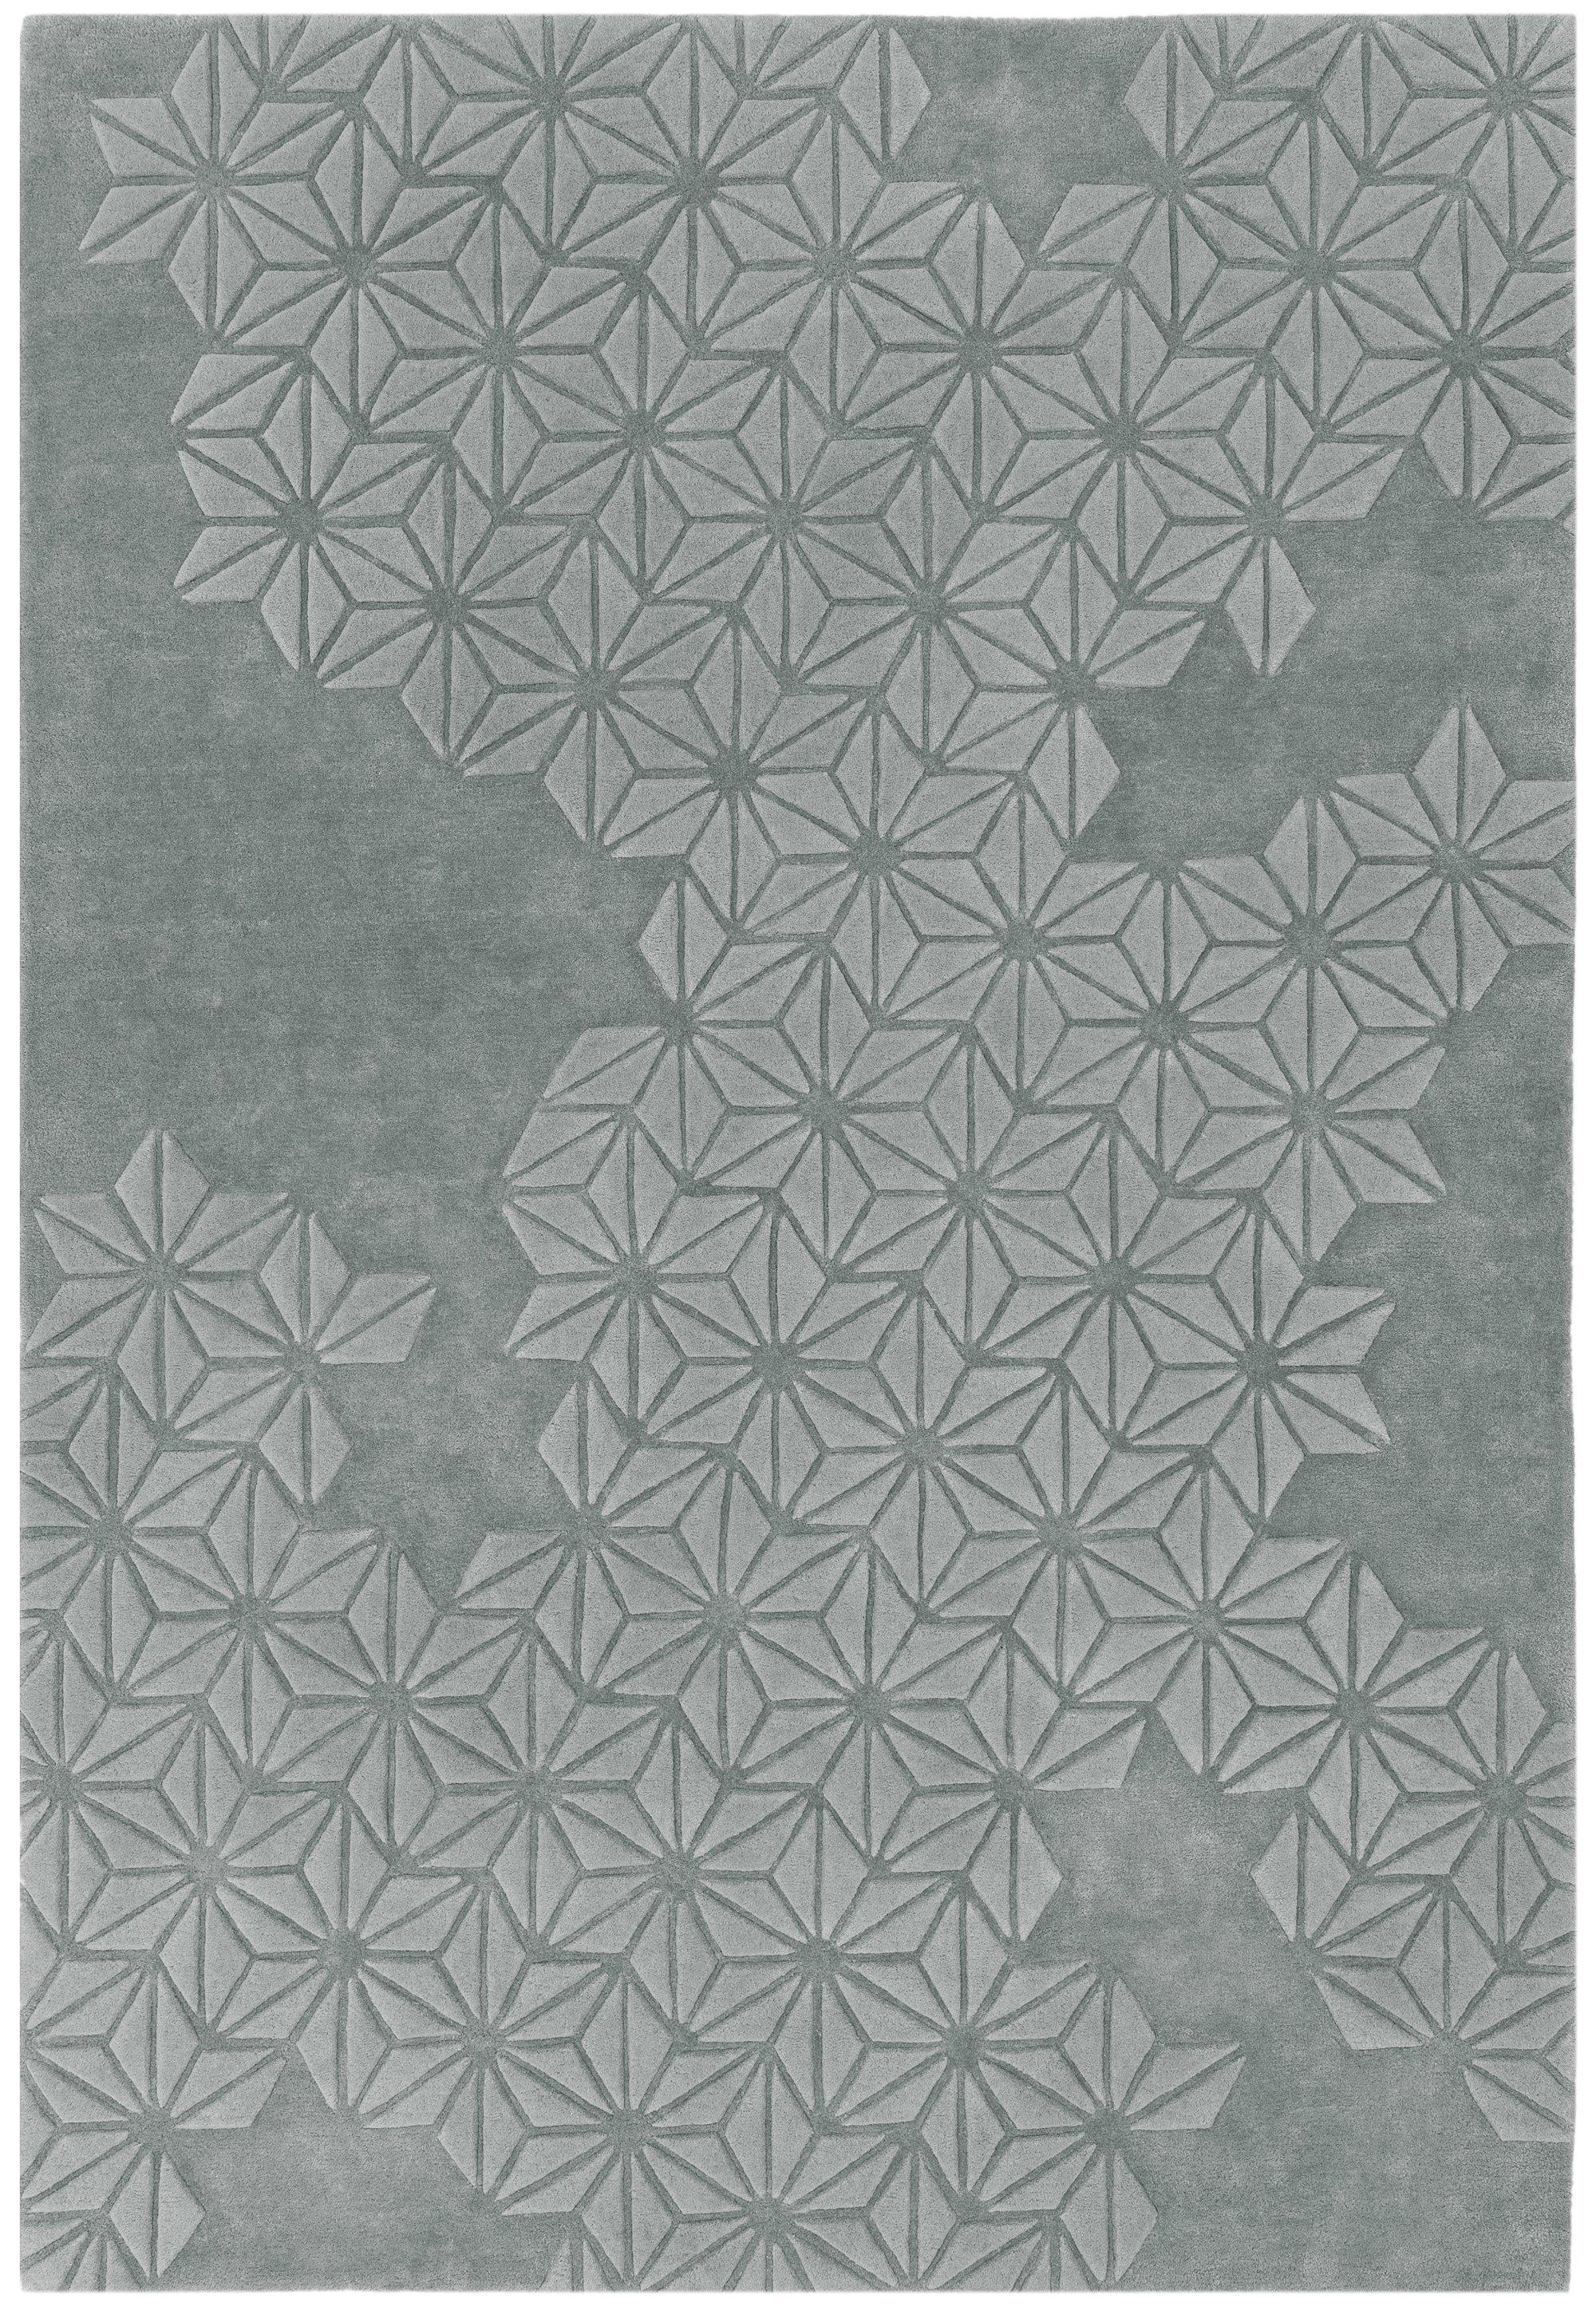 Starburst Rug Silver